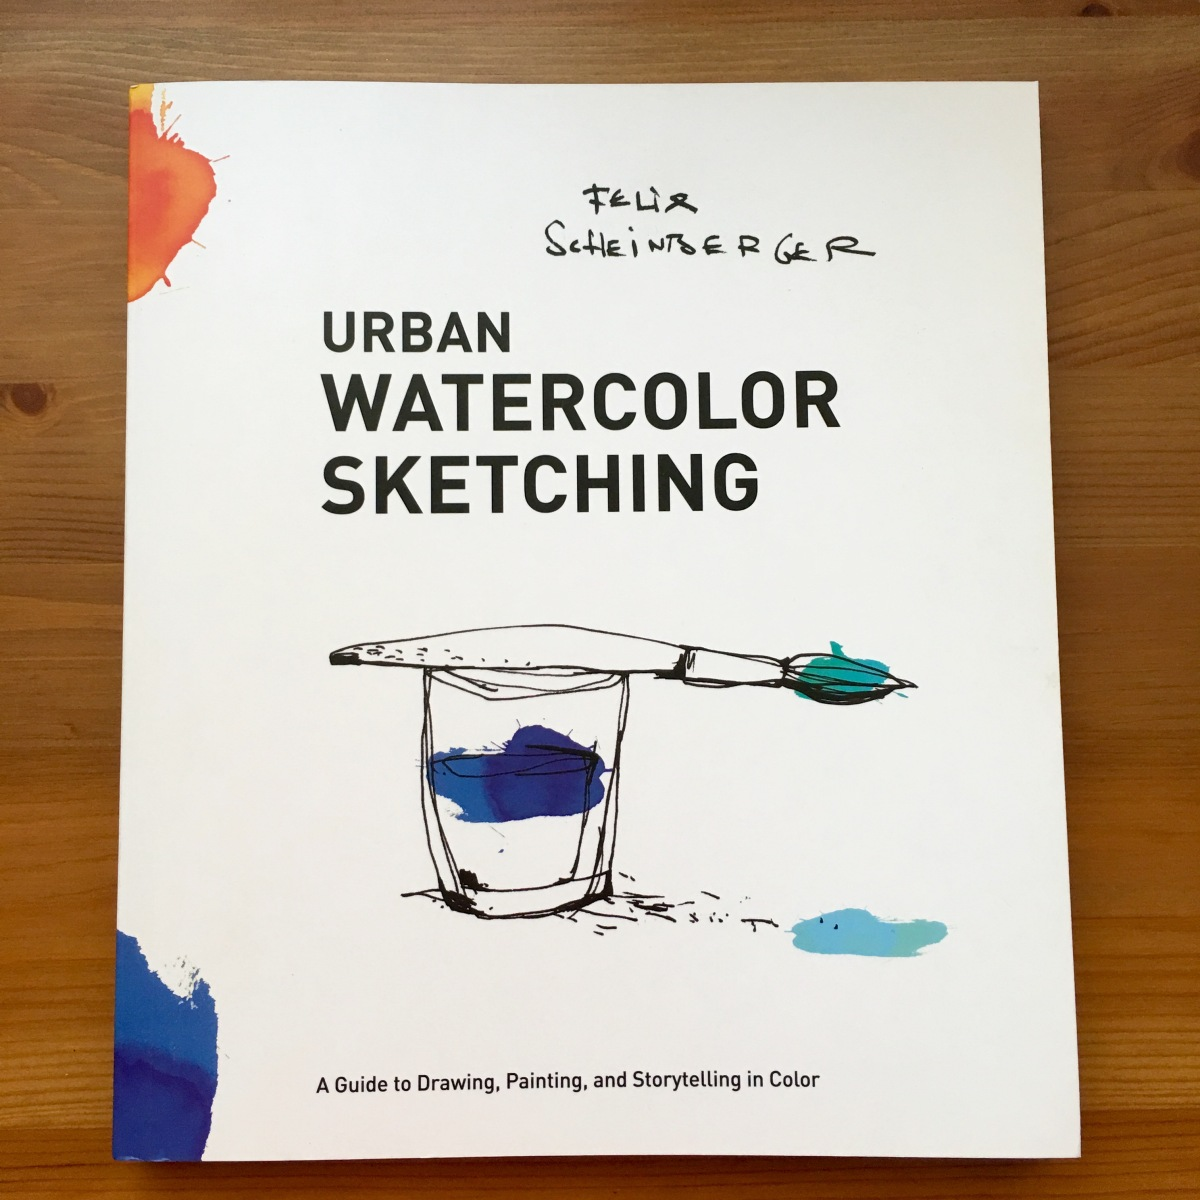 Urban Watercolor Sketching by felix scheinberger